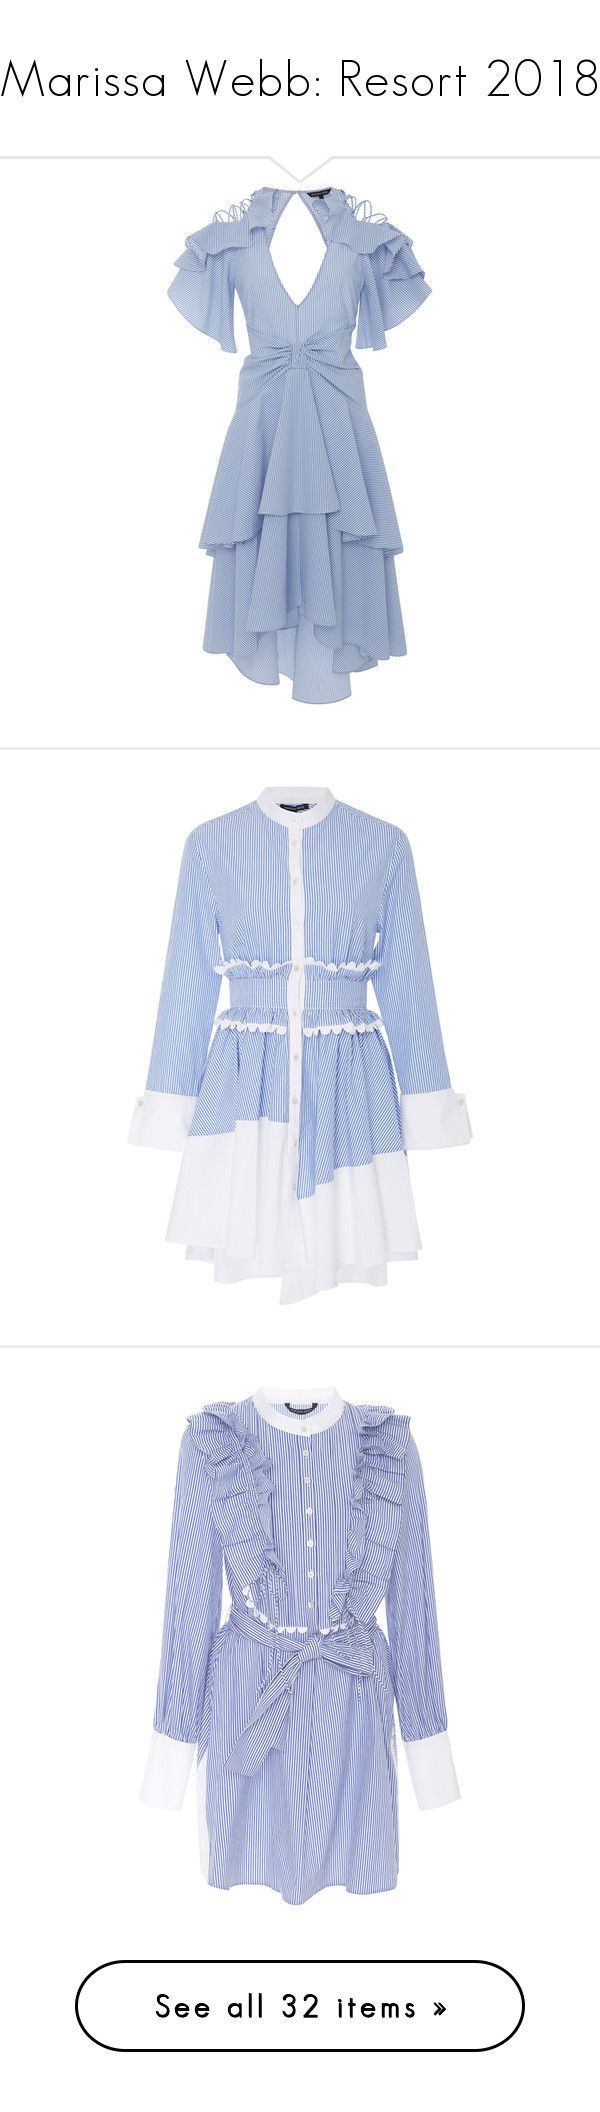 """Marissa Webb: Resort 2018"" by livnd ❤ liked on Polyvore featuring marissawebb, livndfashion, livndmarissawebb, resort2018, dresses, blue, sleeved dresses, blue seersucker dress, seersucker dress and blue tiered dress"